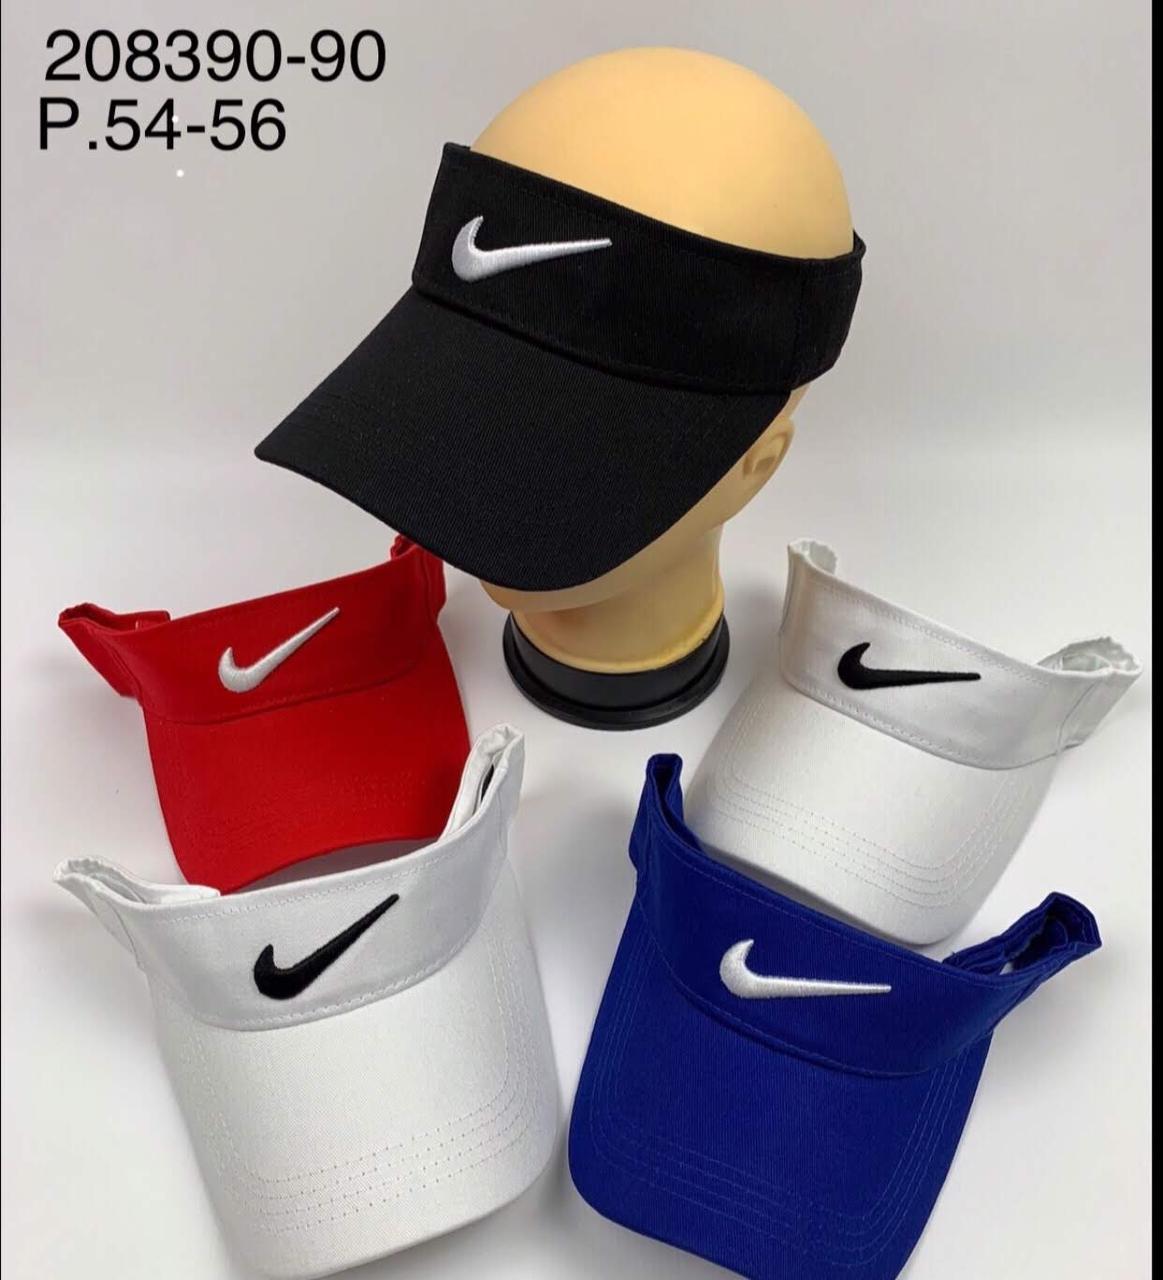 Кепка для мальчика Nike,р.54-56,коттон